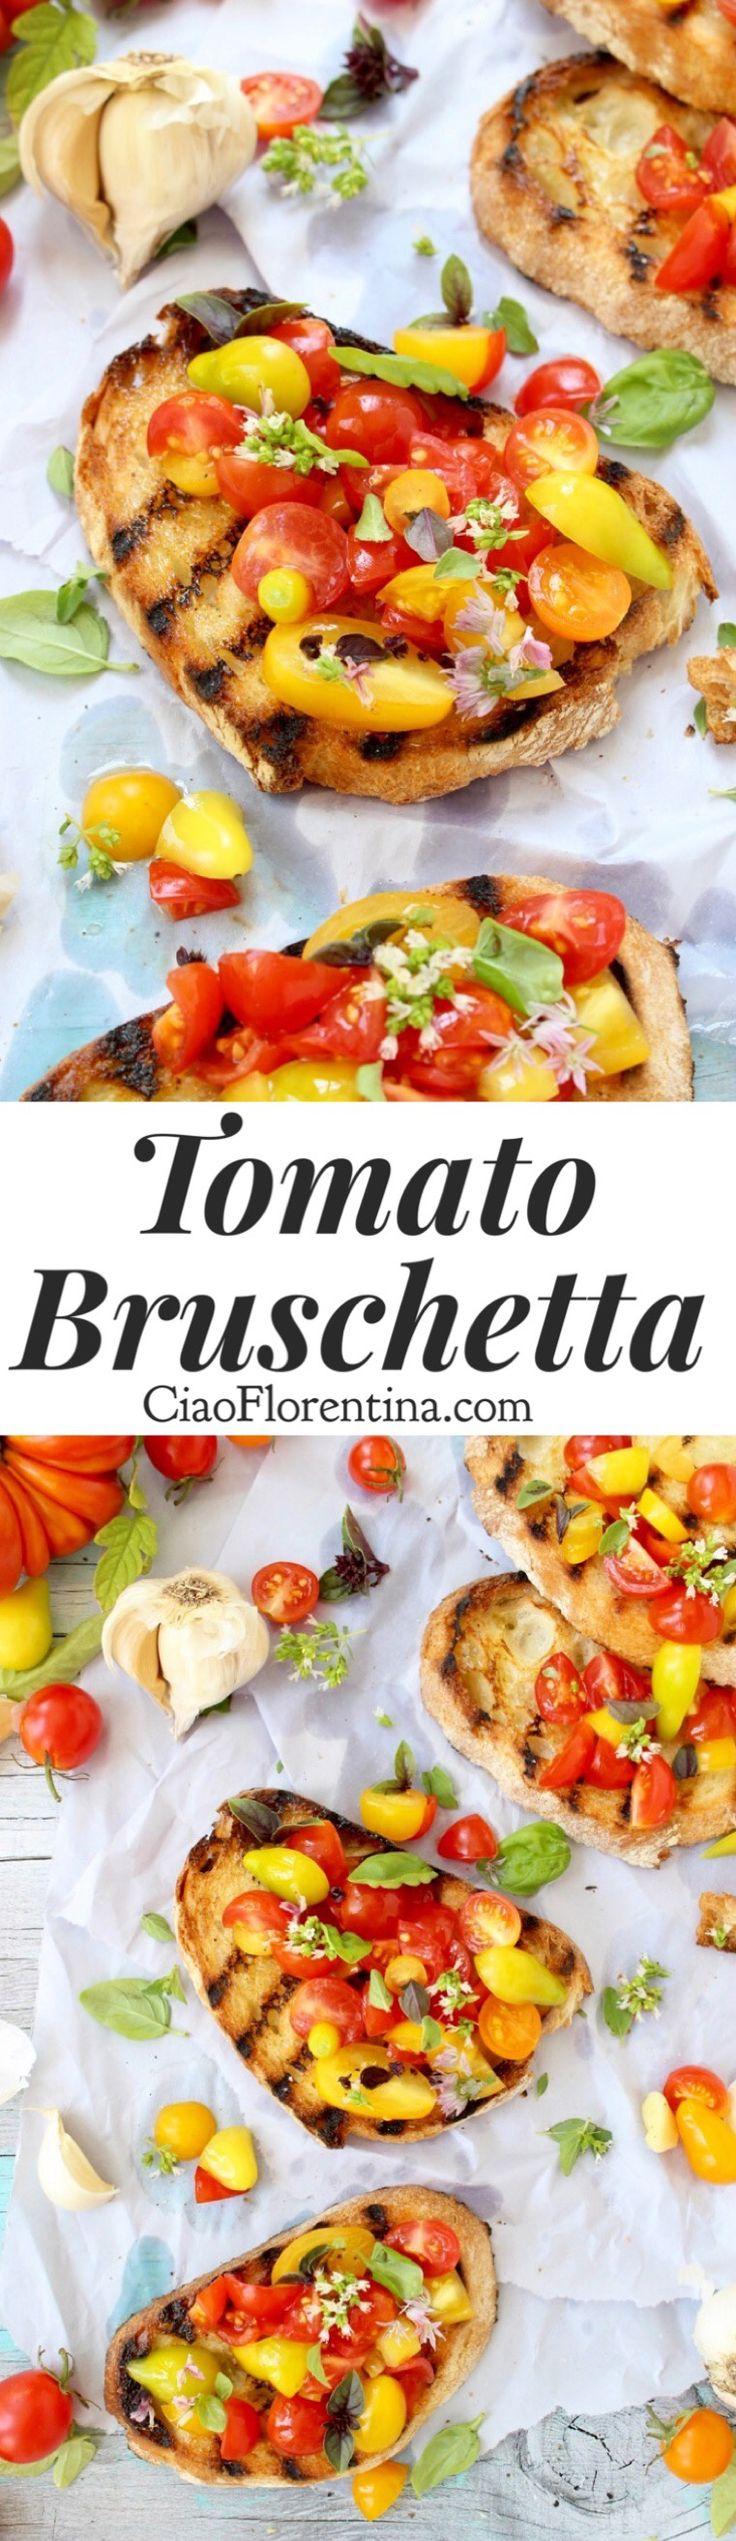 Tomato Bruschetta Recipe, the easy, authentic Italian appetizer made with heirloom tomatoes and fresh basil    | CiaoFlorentina.com @CiaoFlorentina